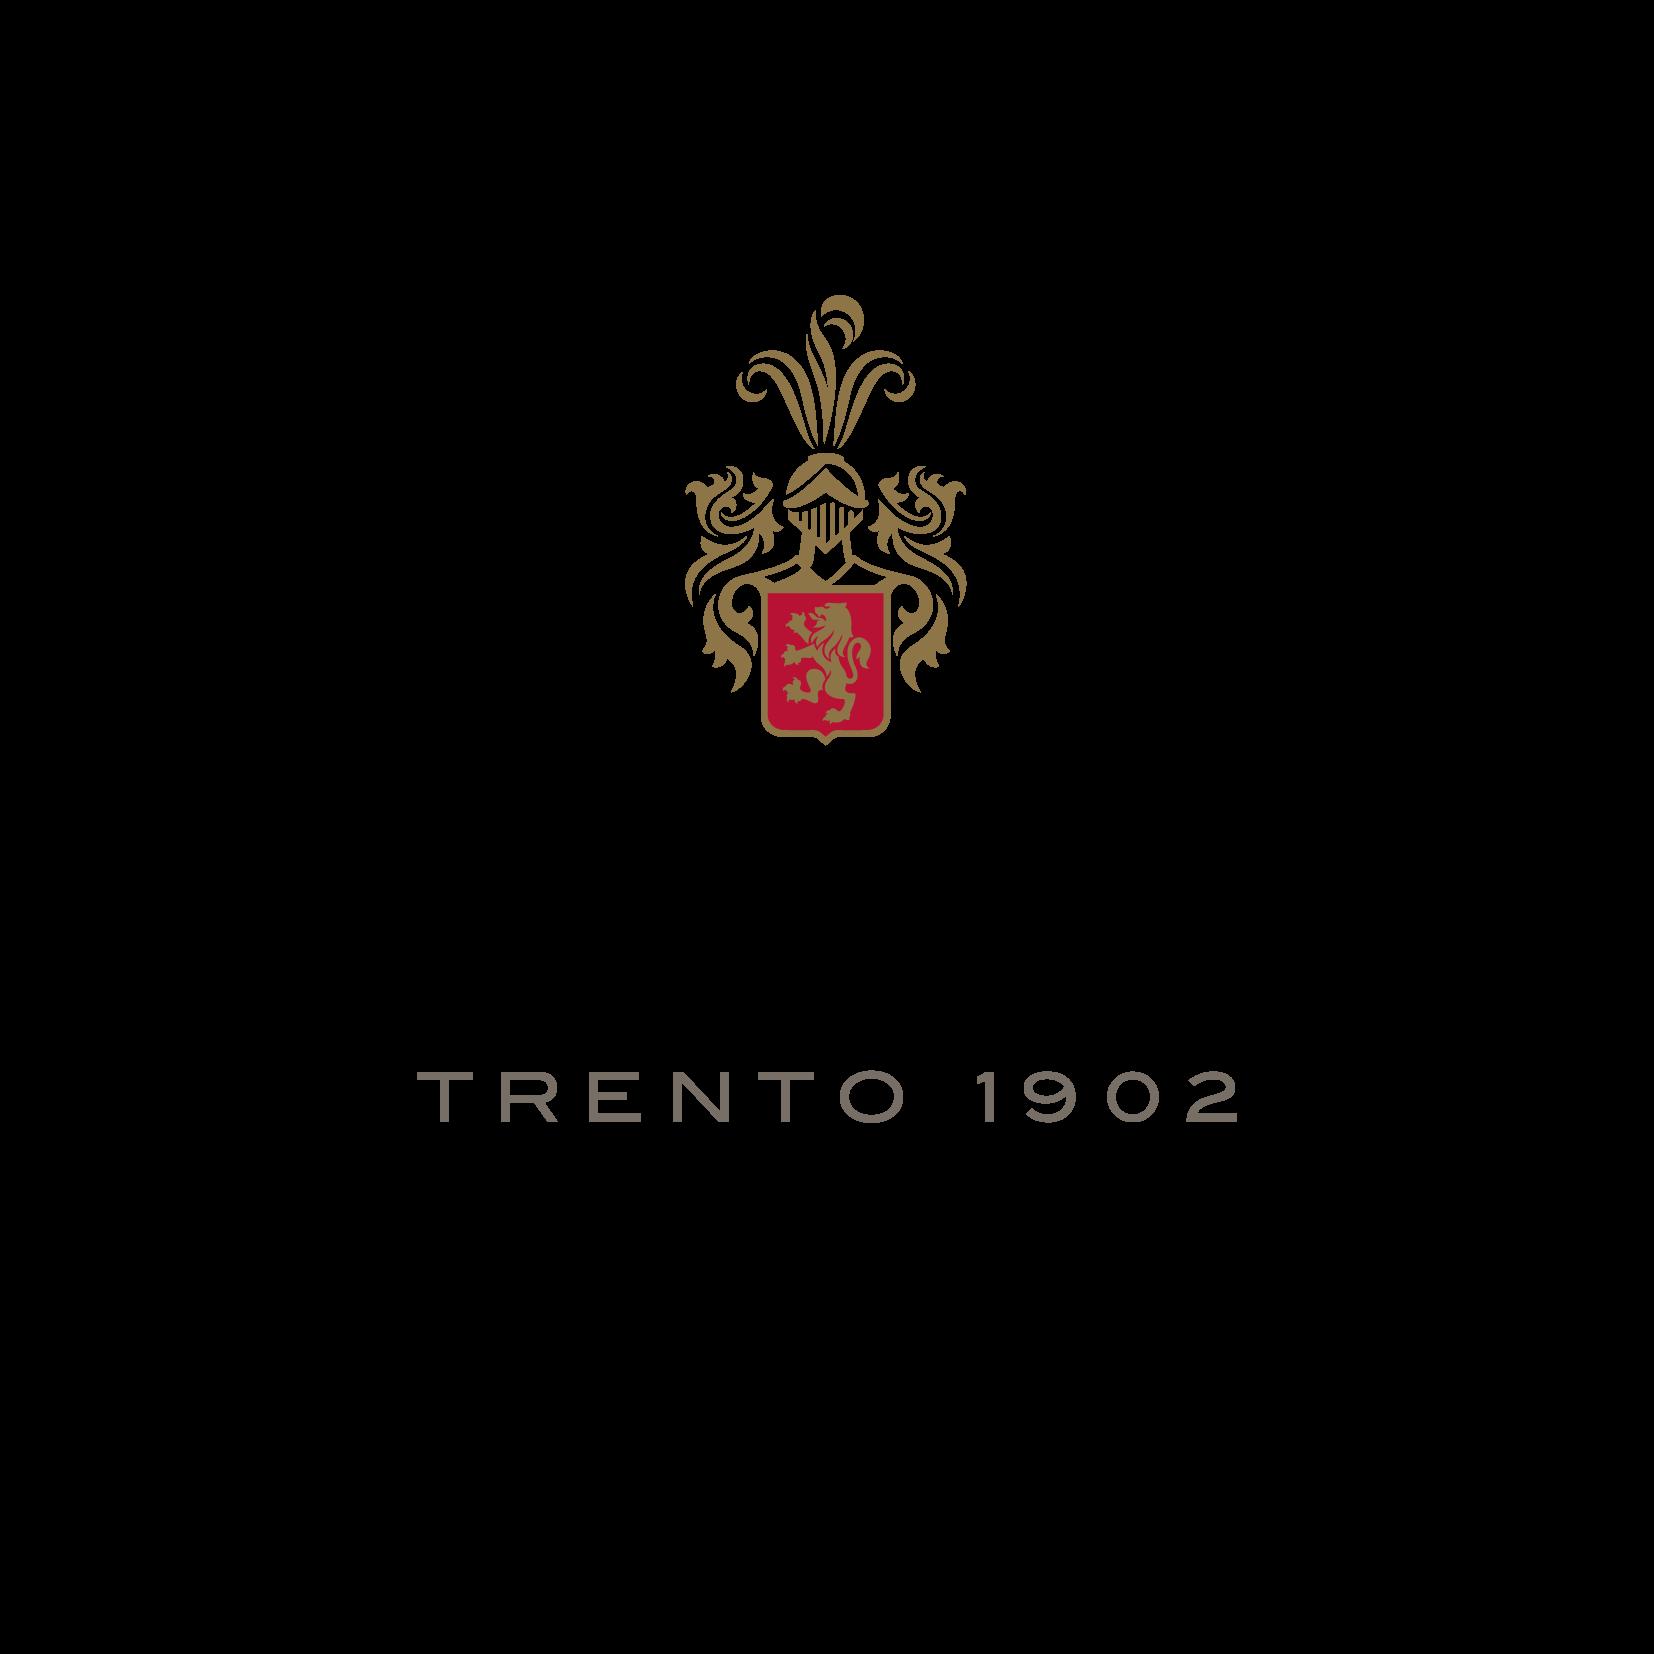 FERRARI-TRENTO